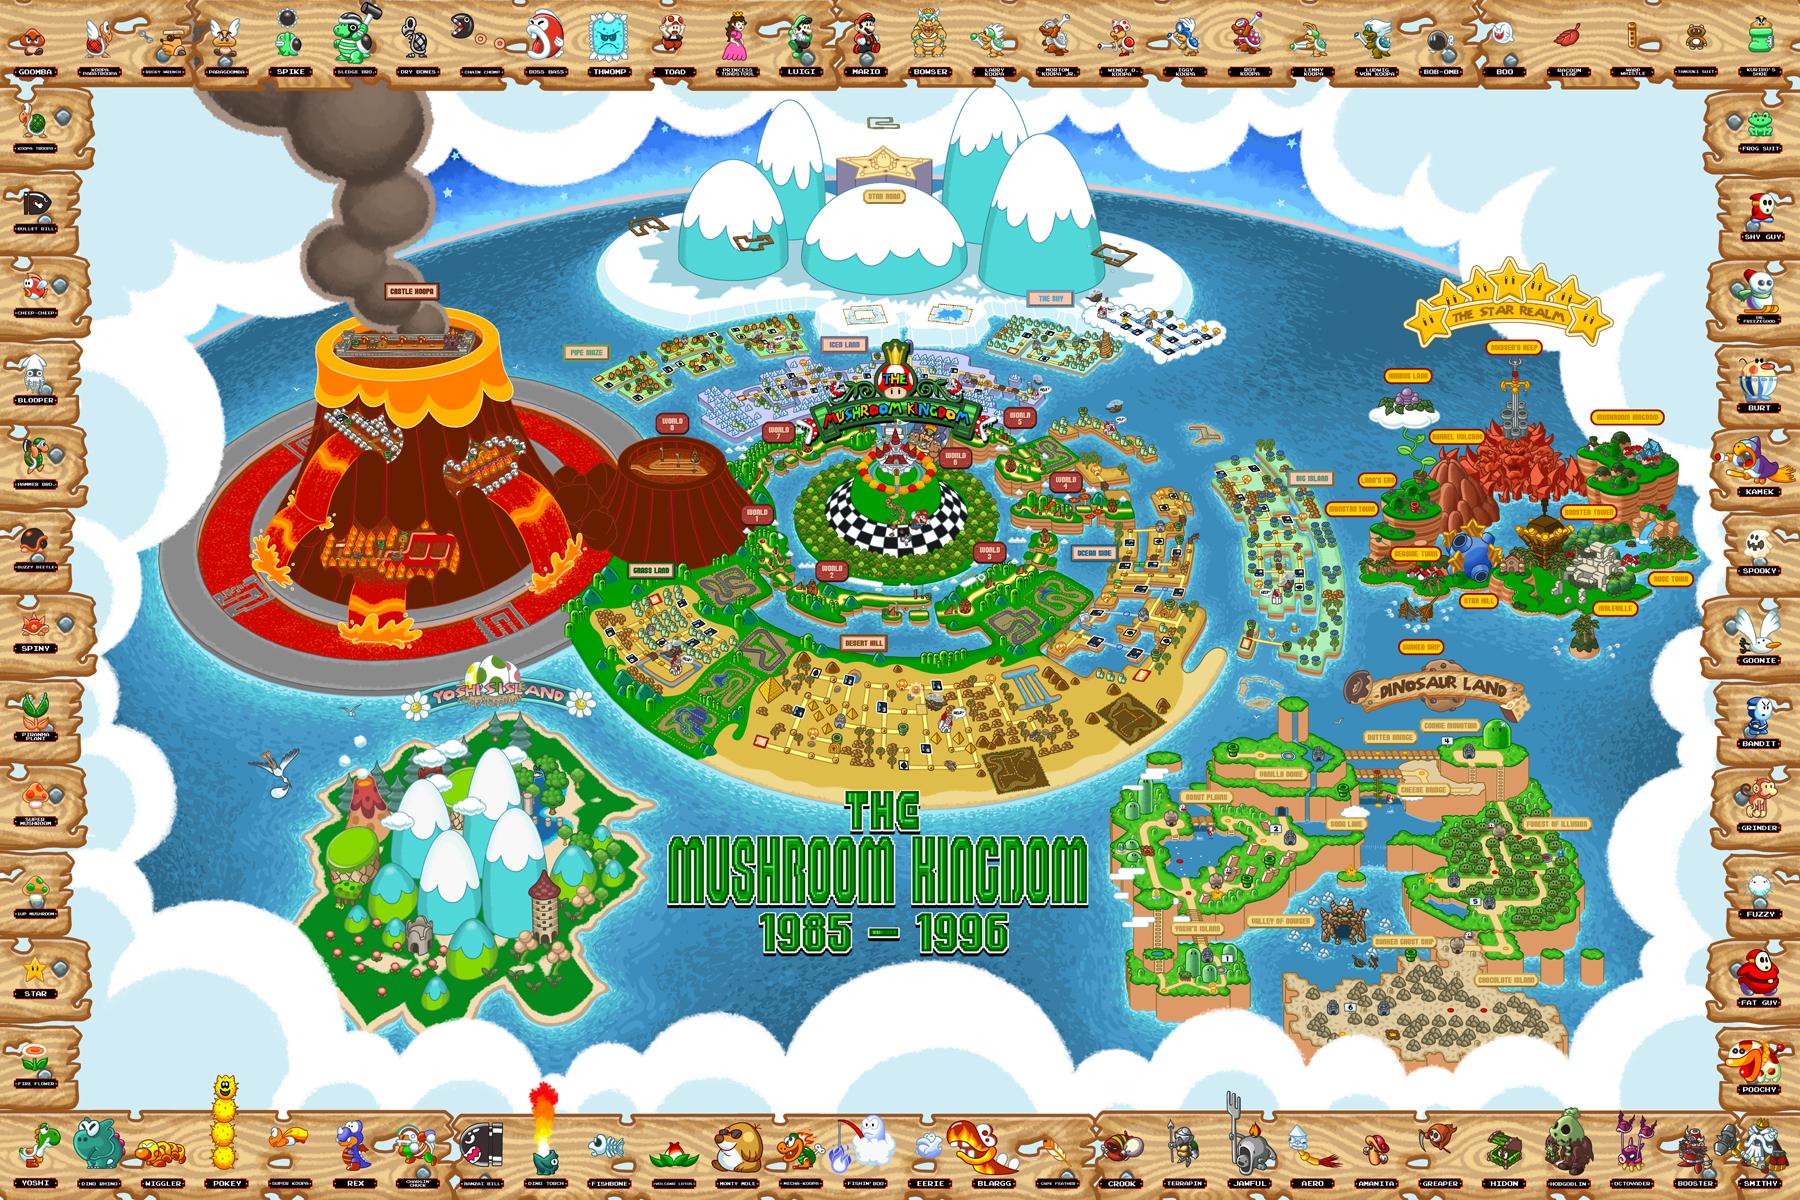 The ultimate map to the entire Mushroom Kingdom | VentureBeat